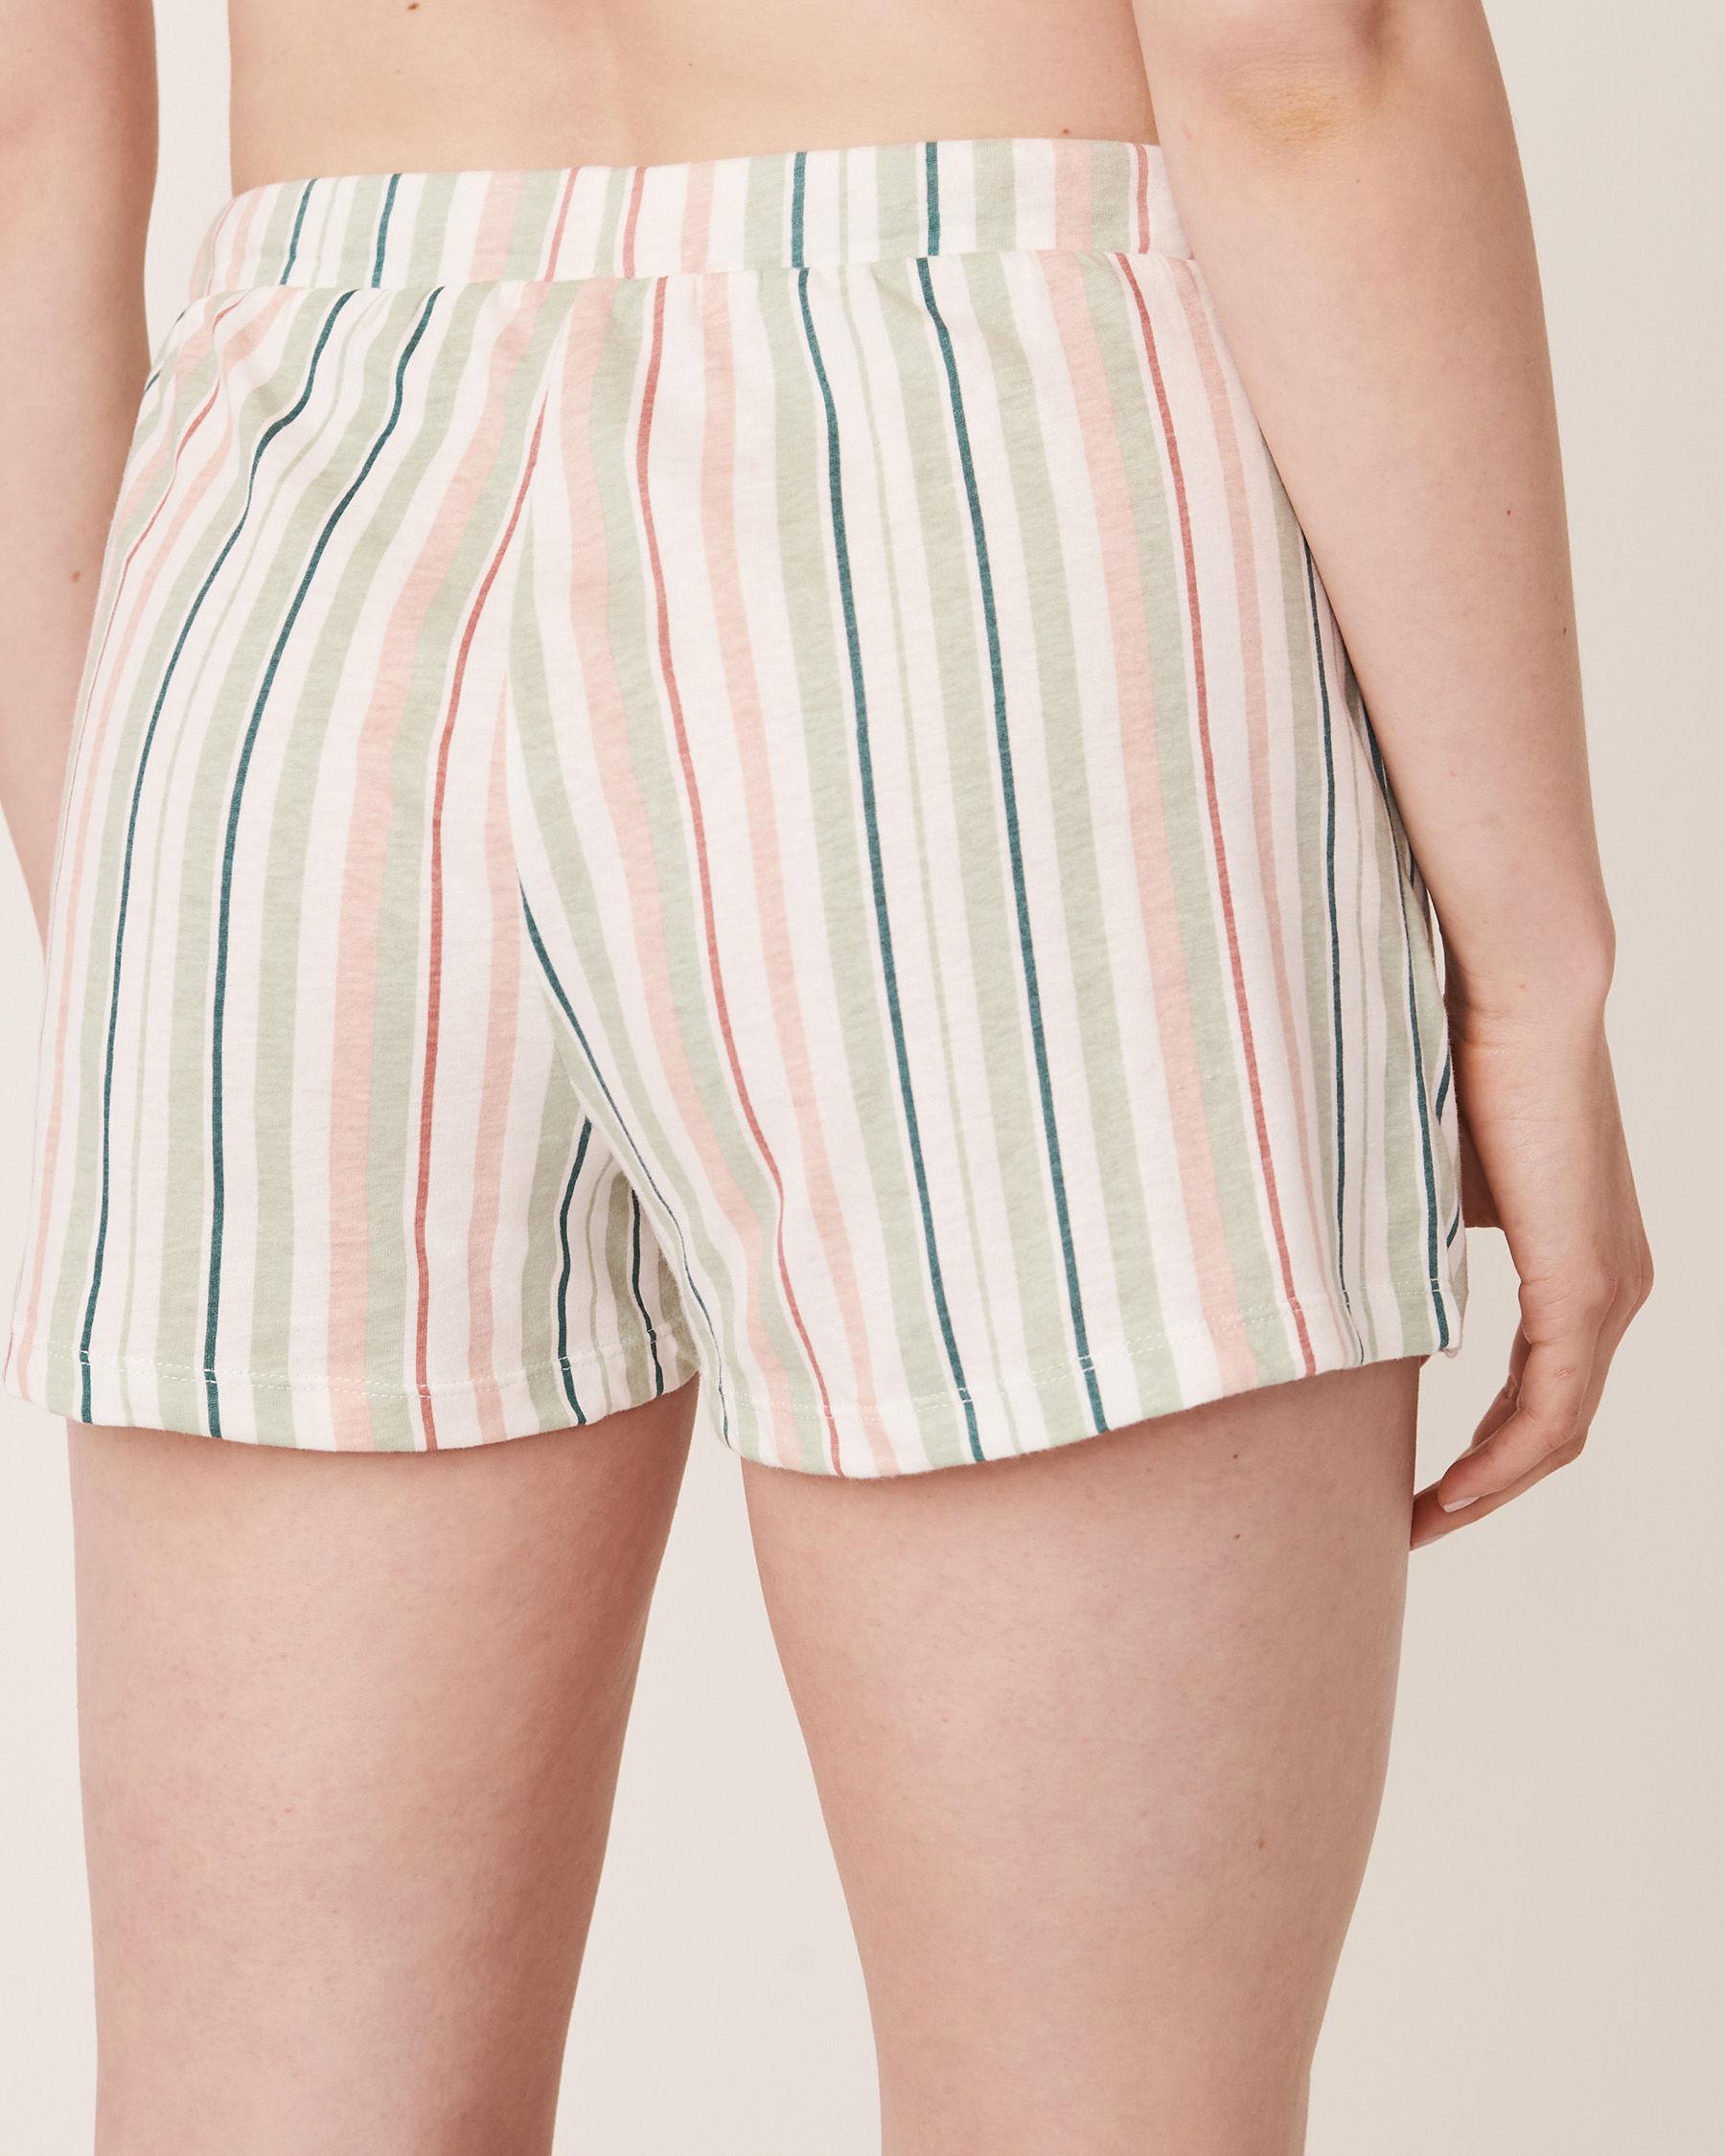 LA VIE EN ROSE Pyjama Short with Pockets Multi stripes 40200090 - View2